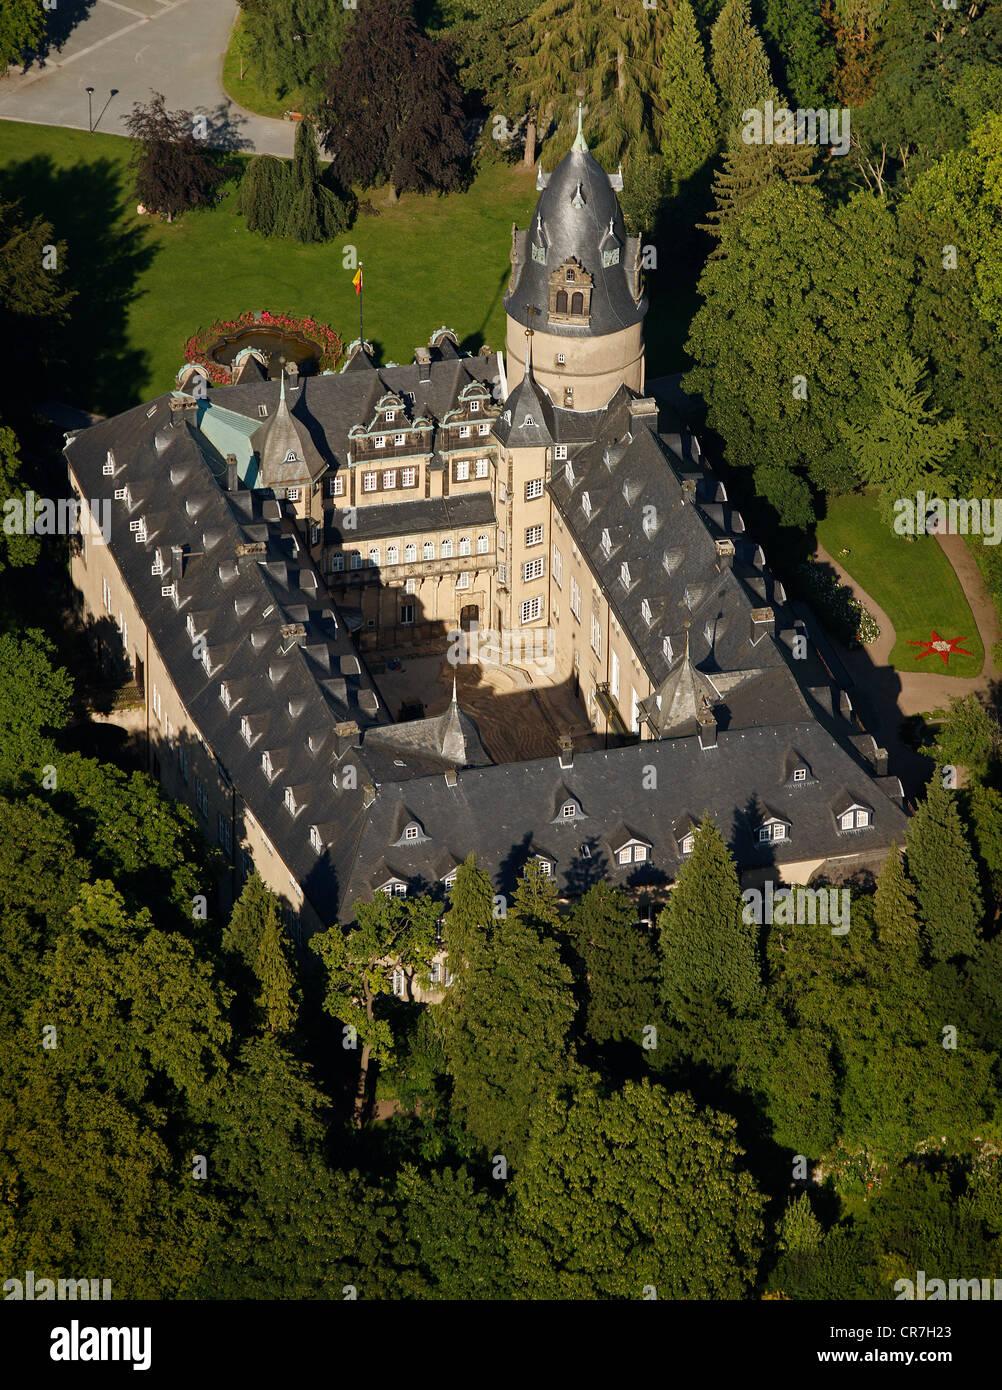 Aerial view, Fuerstliches Residenzschloss Detmold or Princely Residence castle Detmold, Ostwestfalen-Lippe, eastern Westphalia Stock Photo